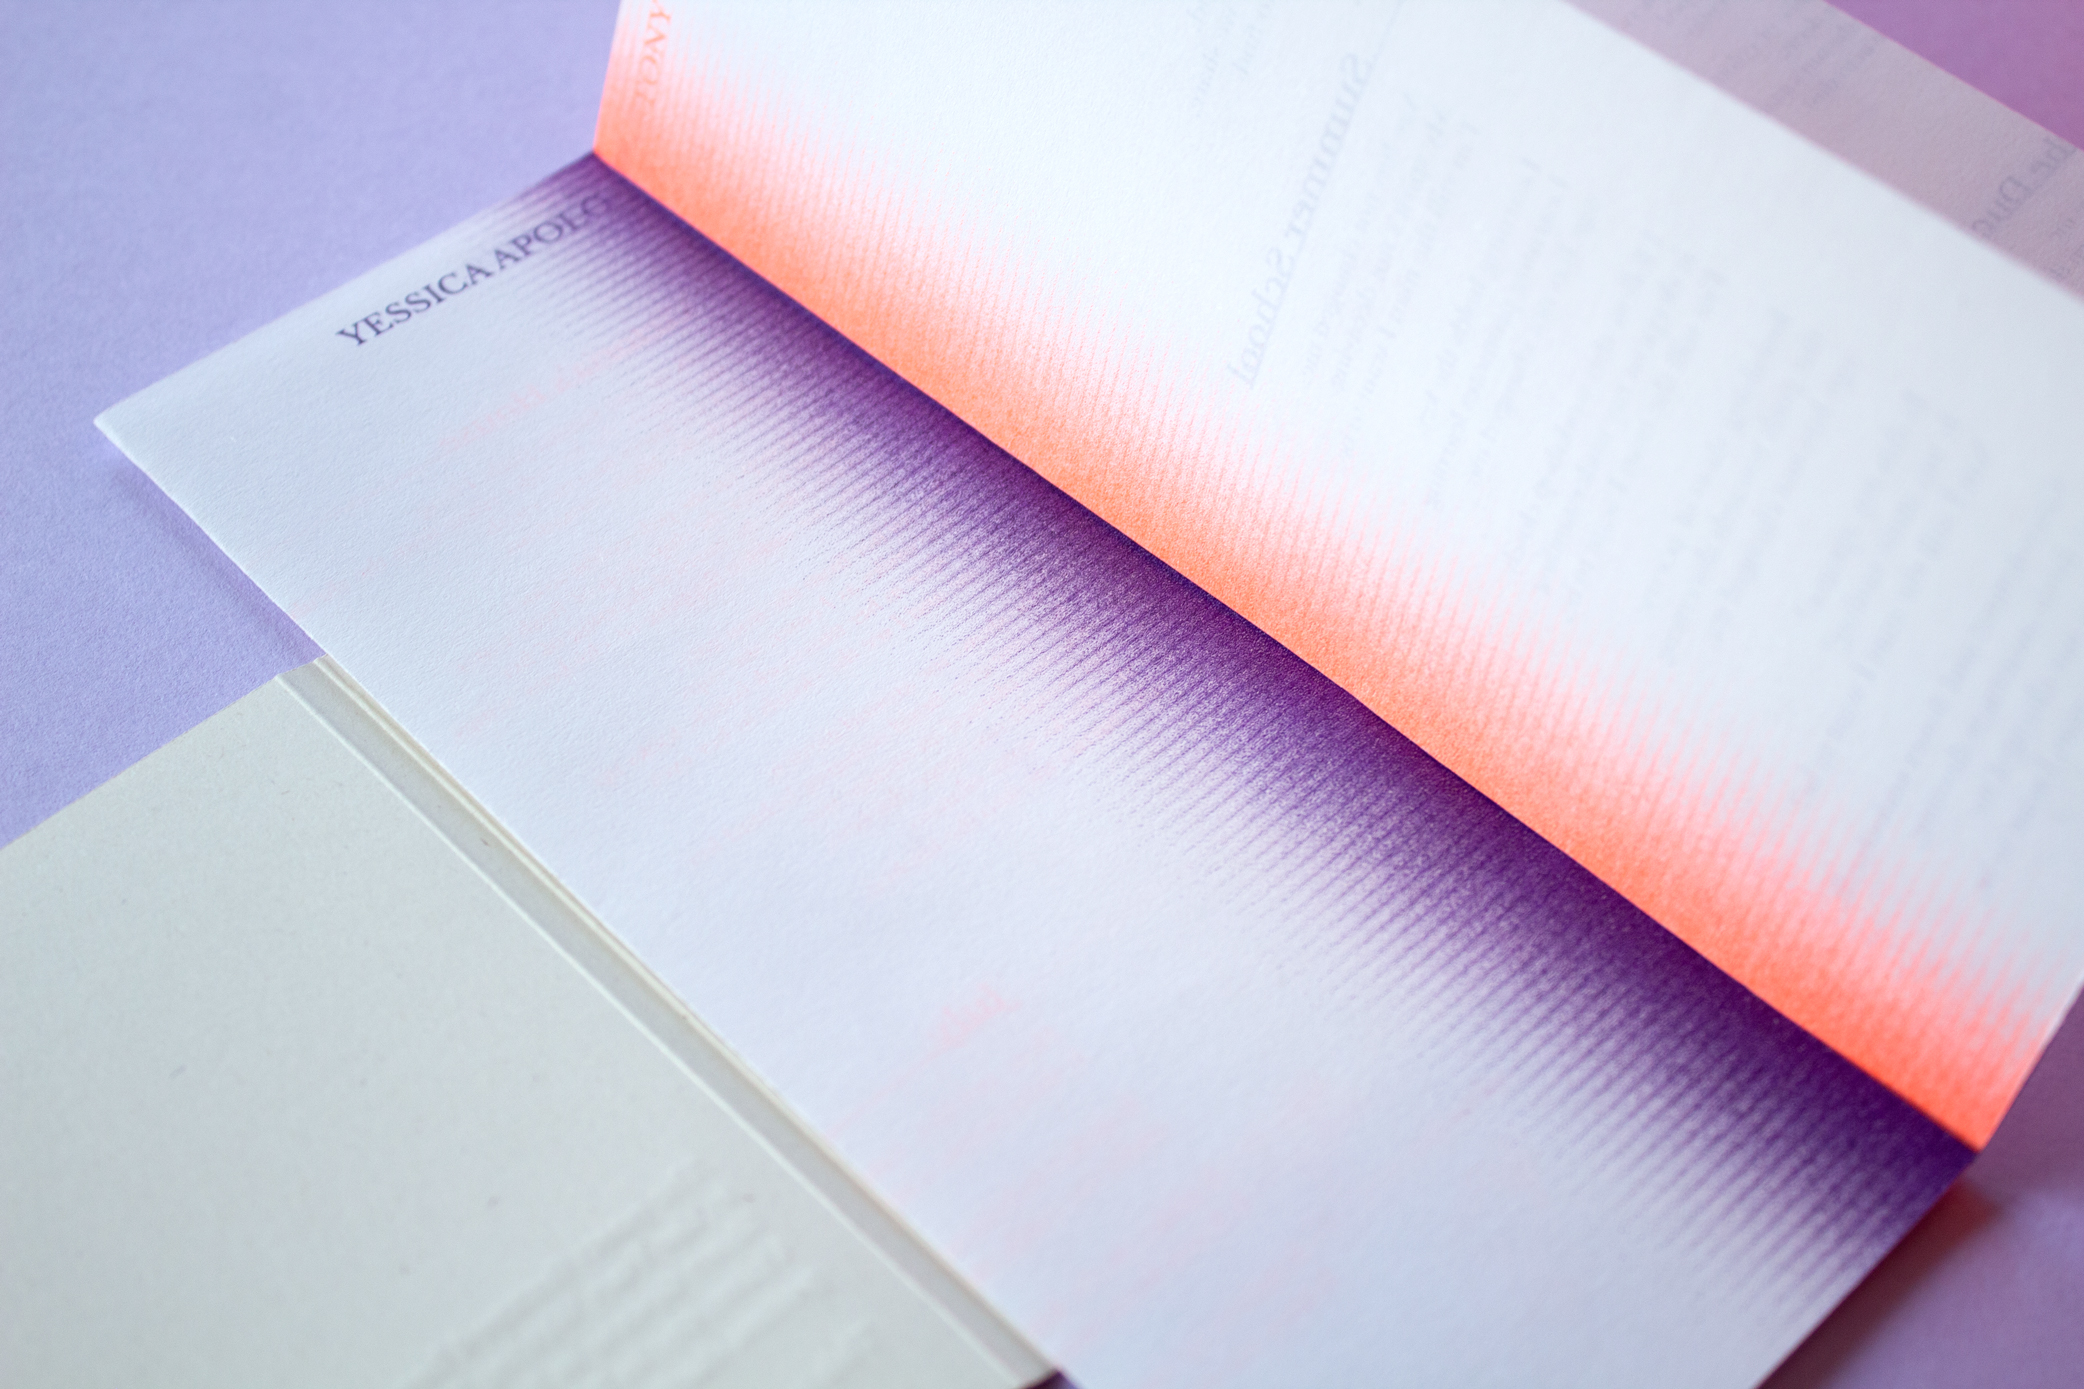 Four Poets - Dizzy Ink - Book Design - Risograph.jpg.jpg